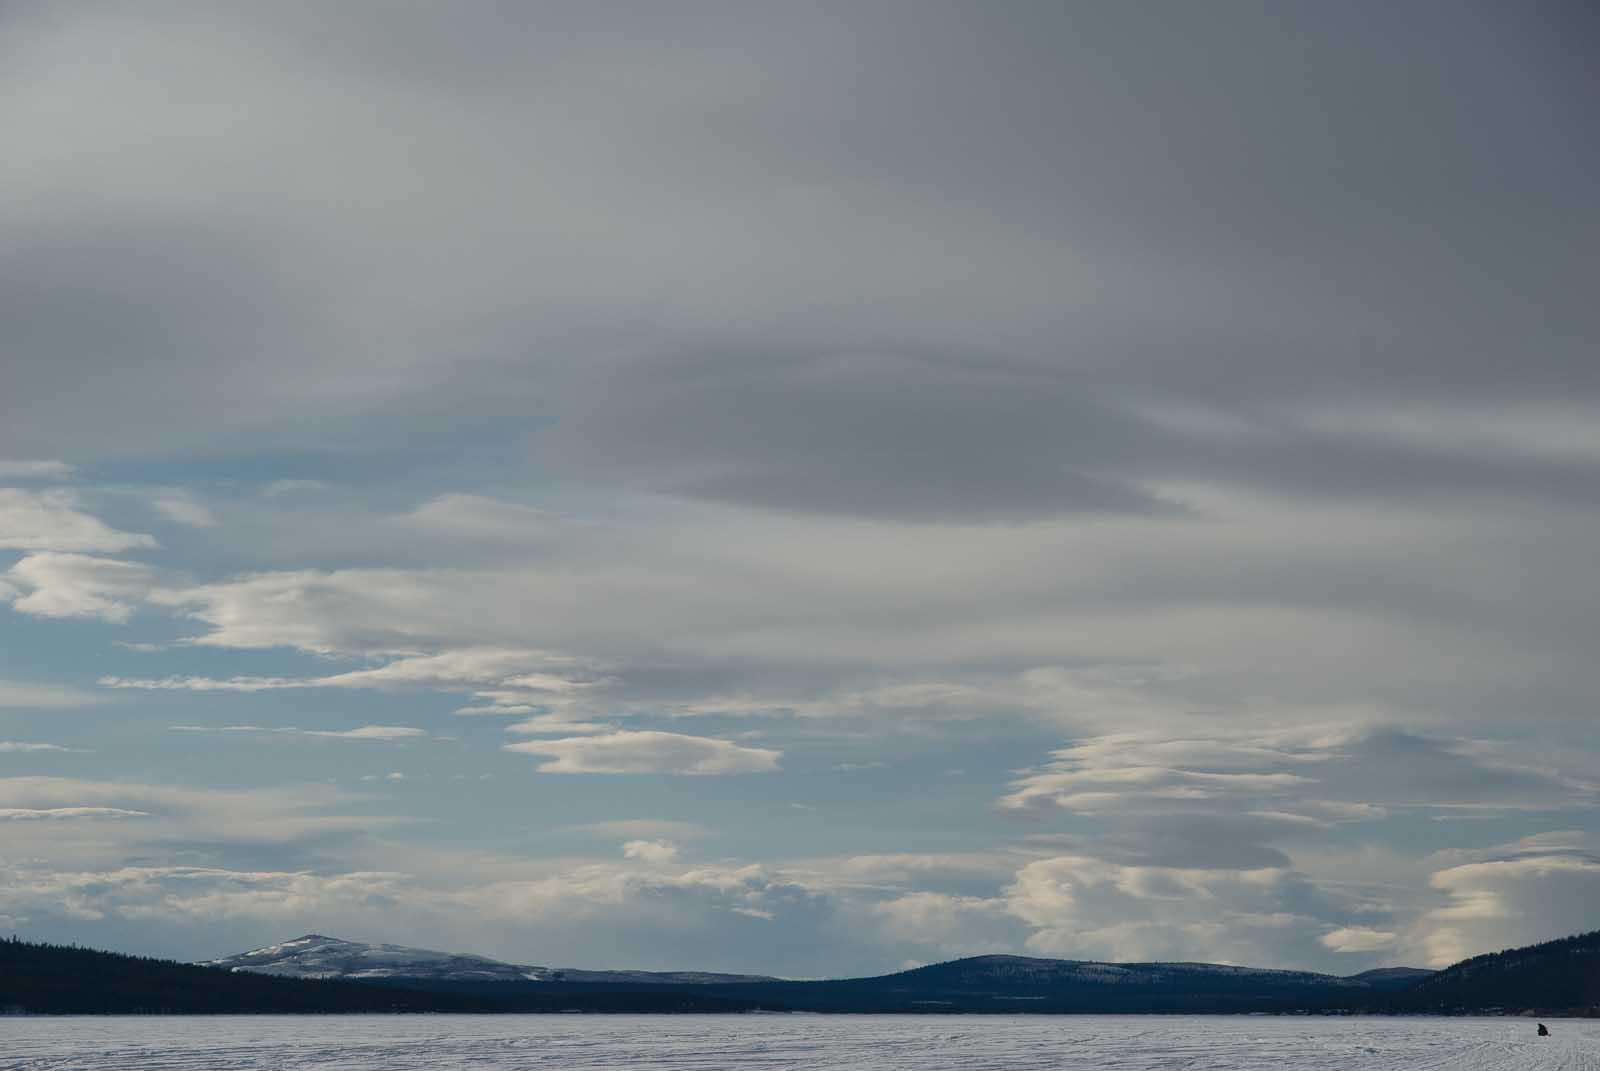 0401_jukkasjärvi_012